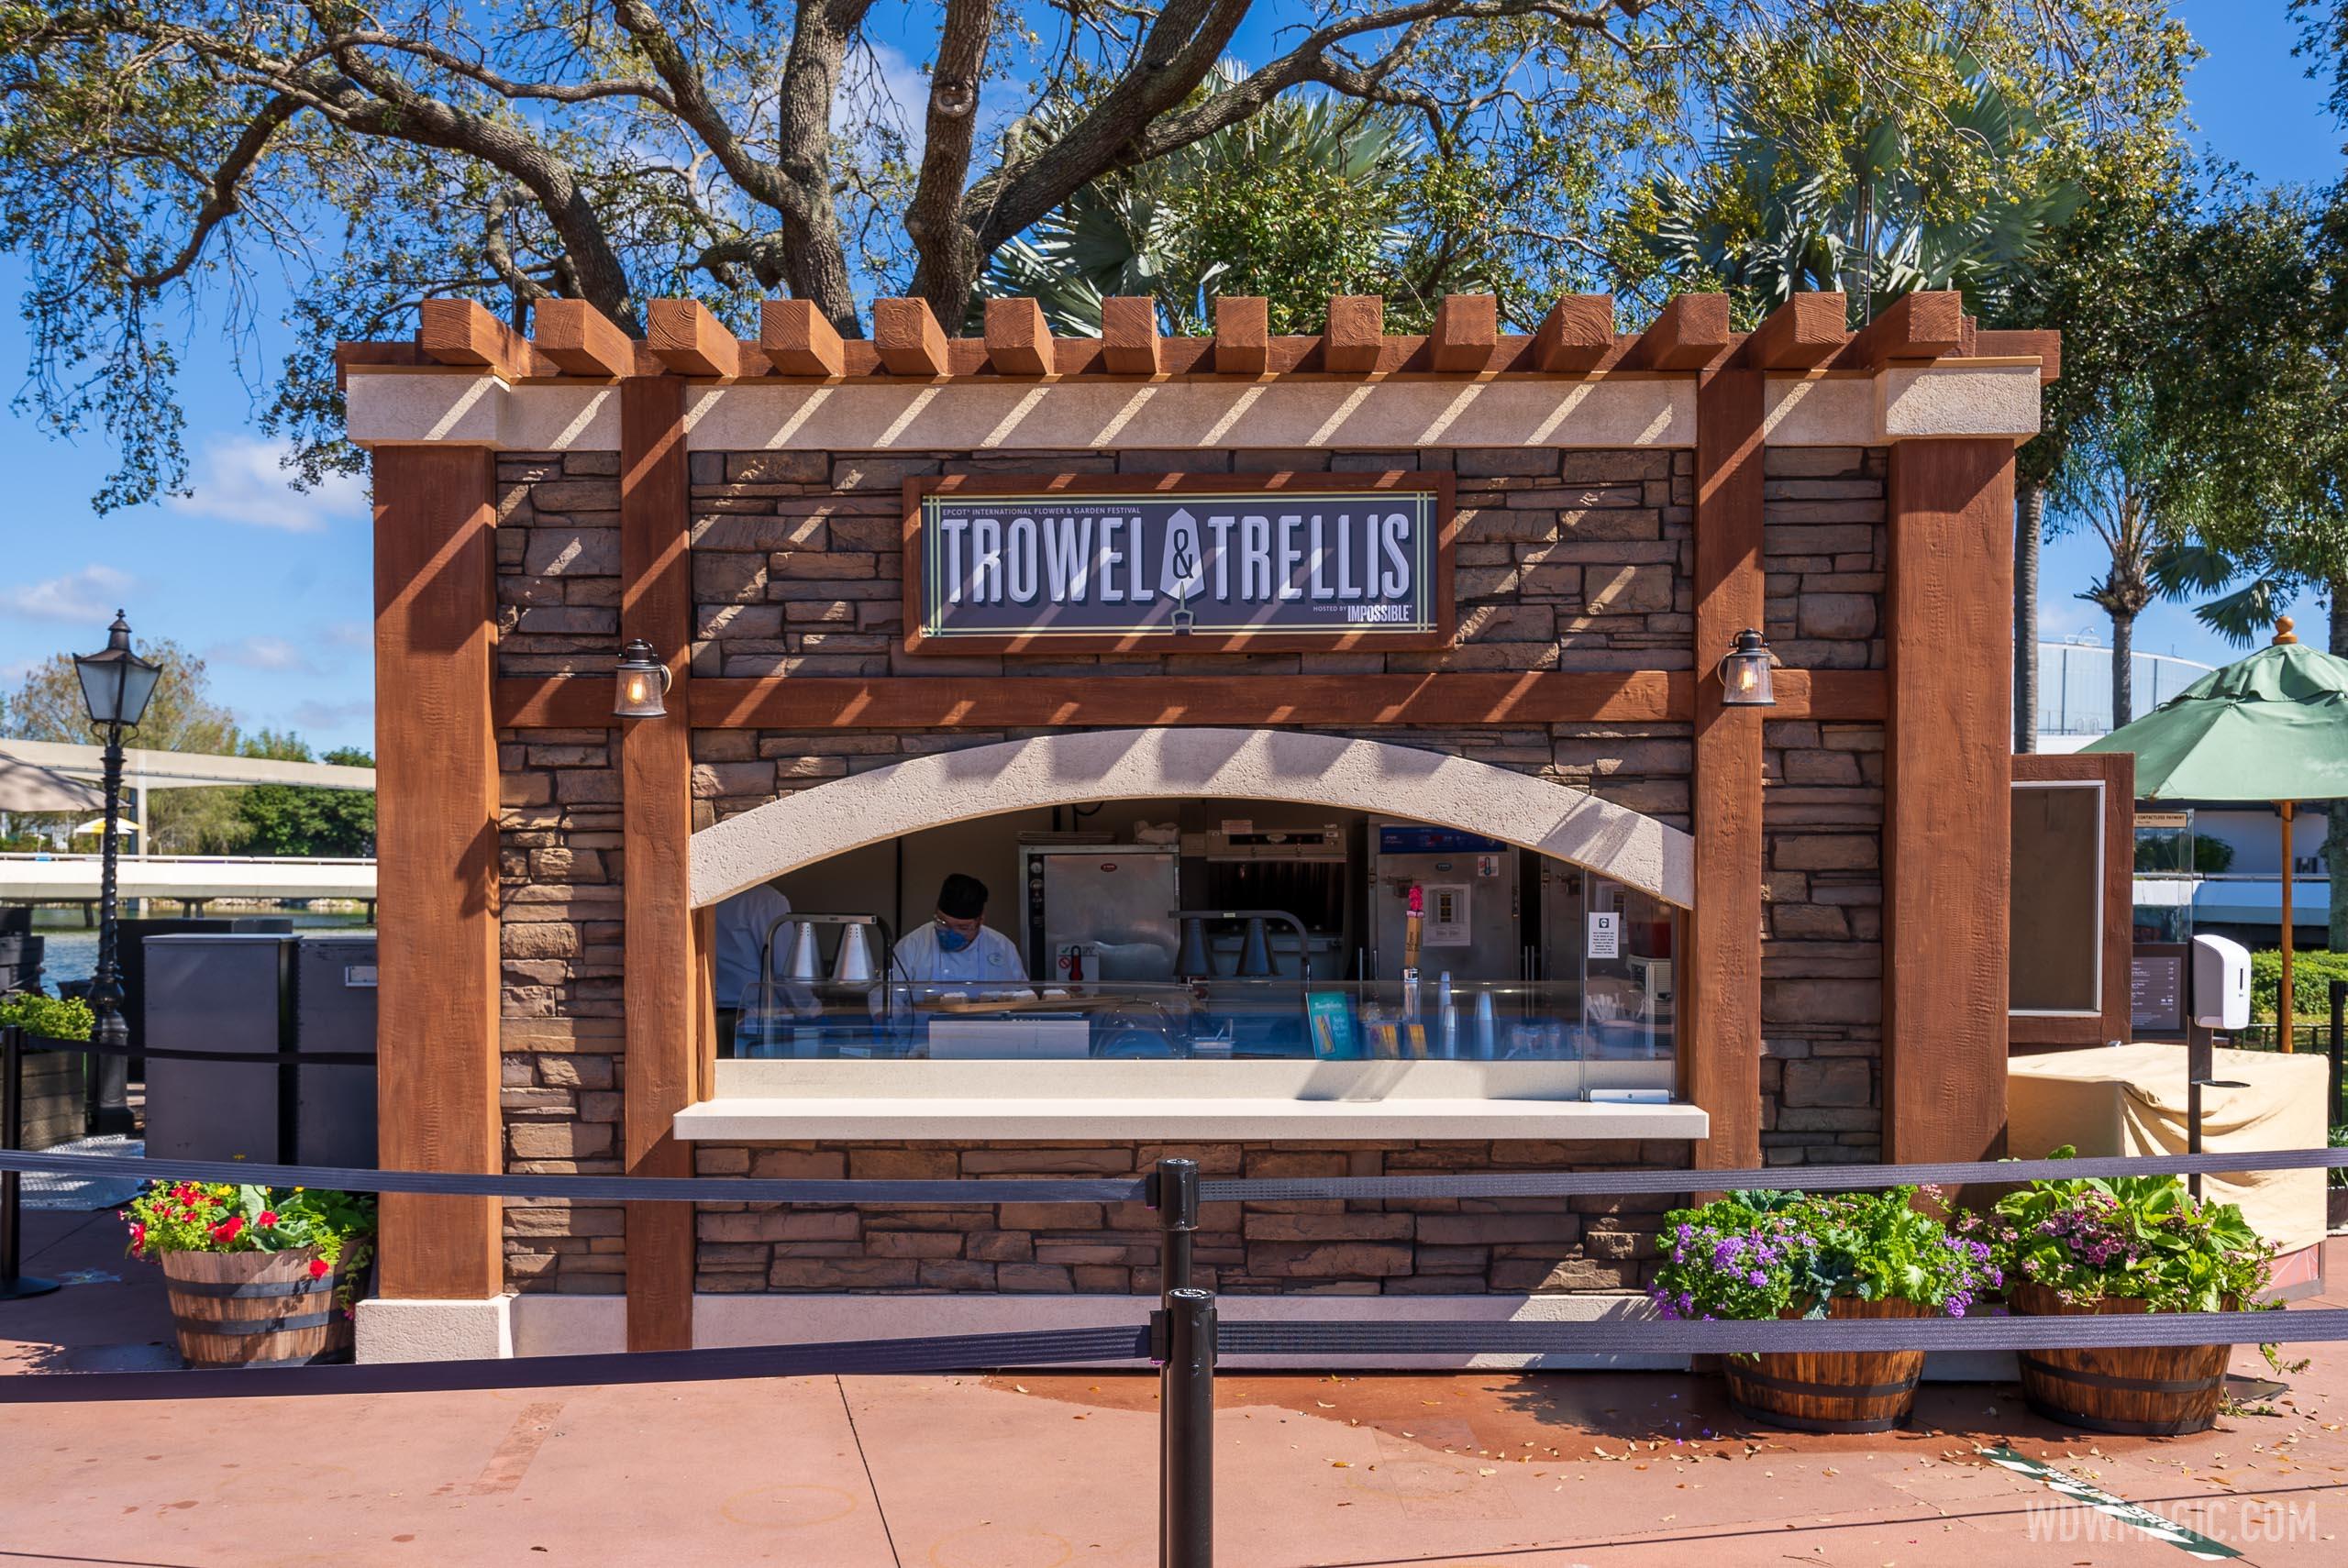 Trowel and Trellis kiosk